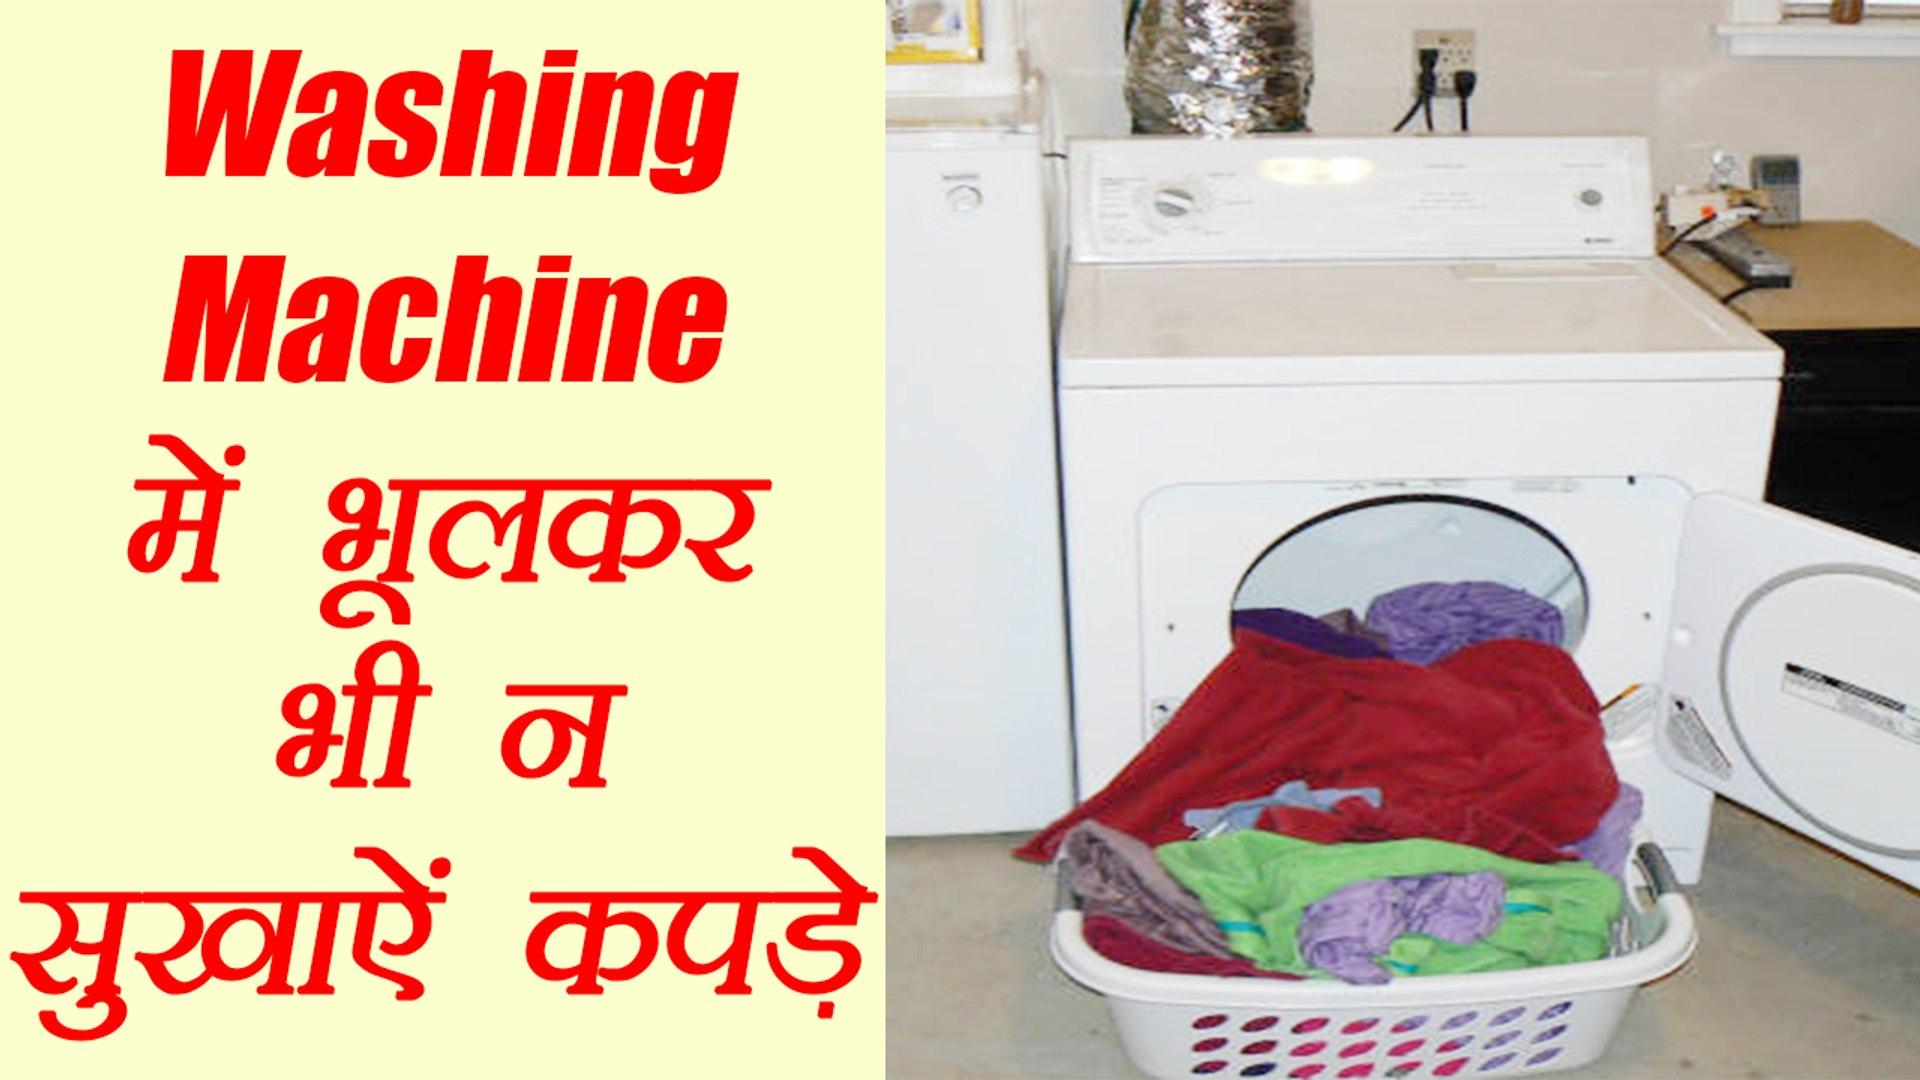 Washing Machine Tips: मशीन में न सूखाऐं ये कपड़े, Do not dry these Clothes in Machine | Boldsky